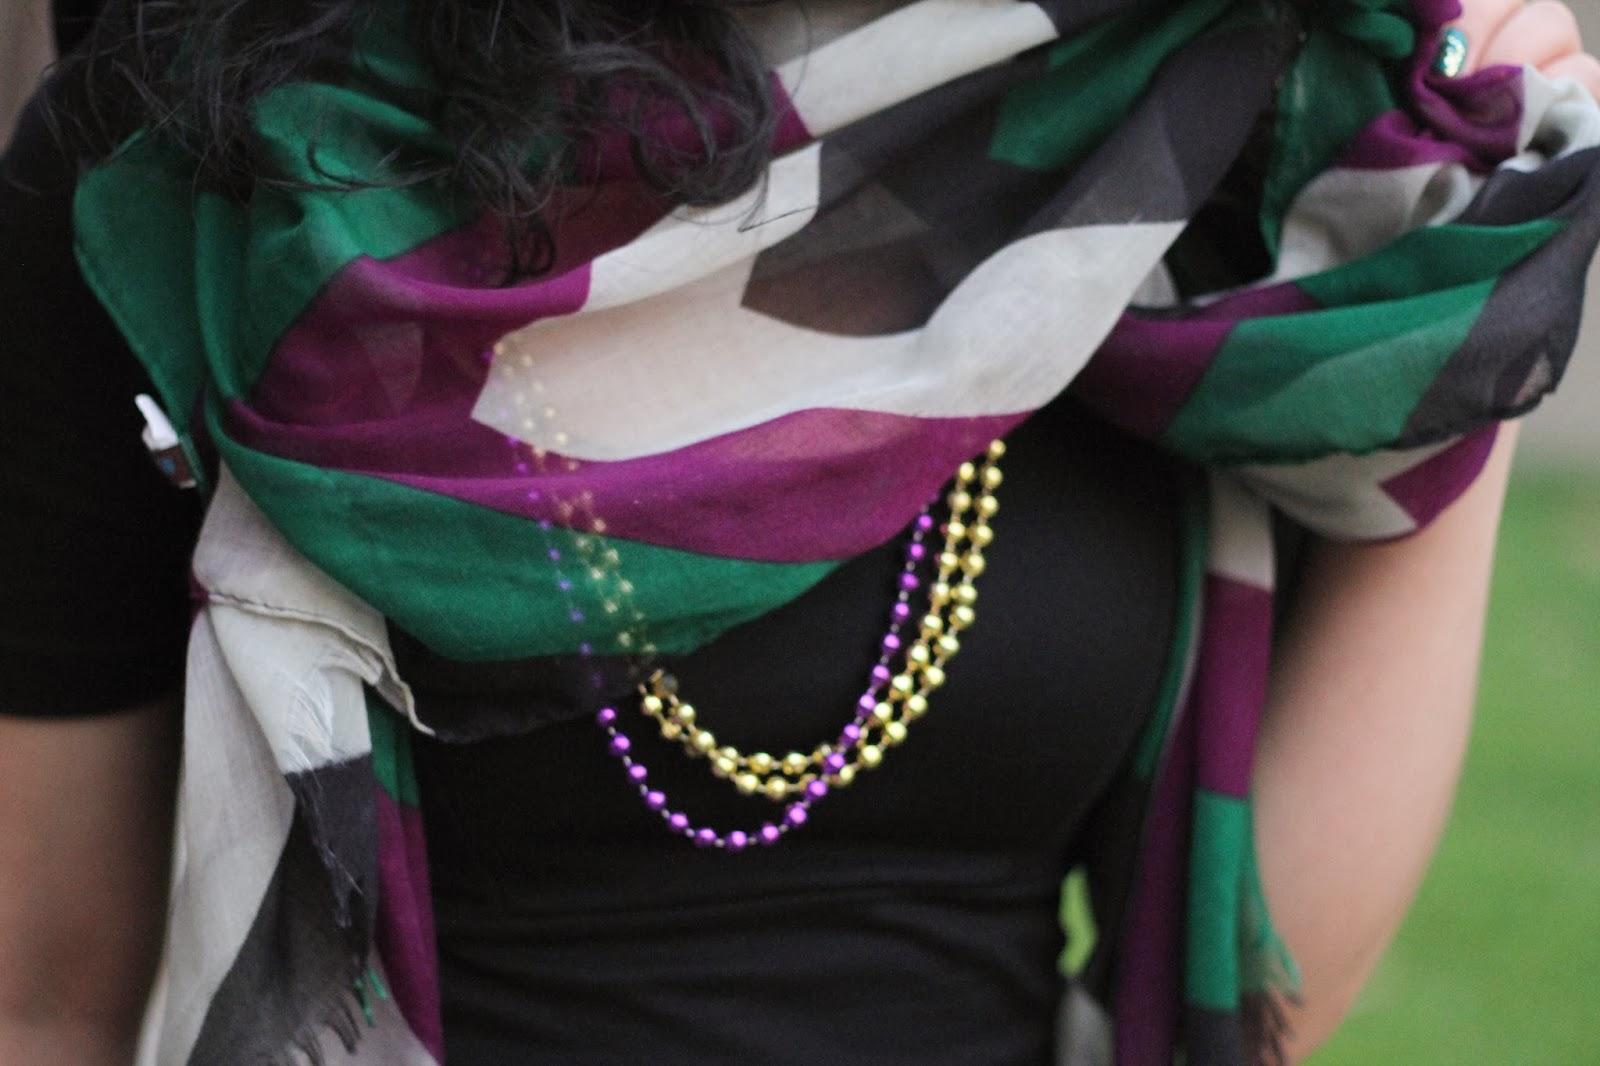 Mardi Gras Scarf and Beads